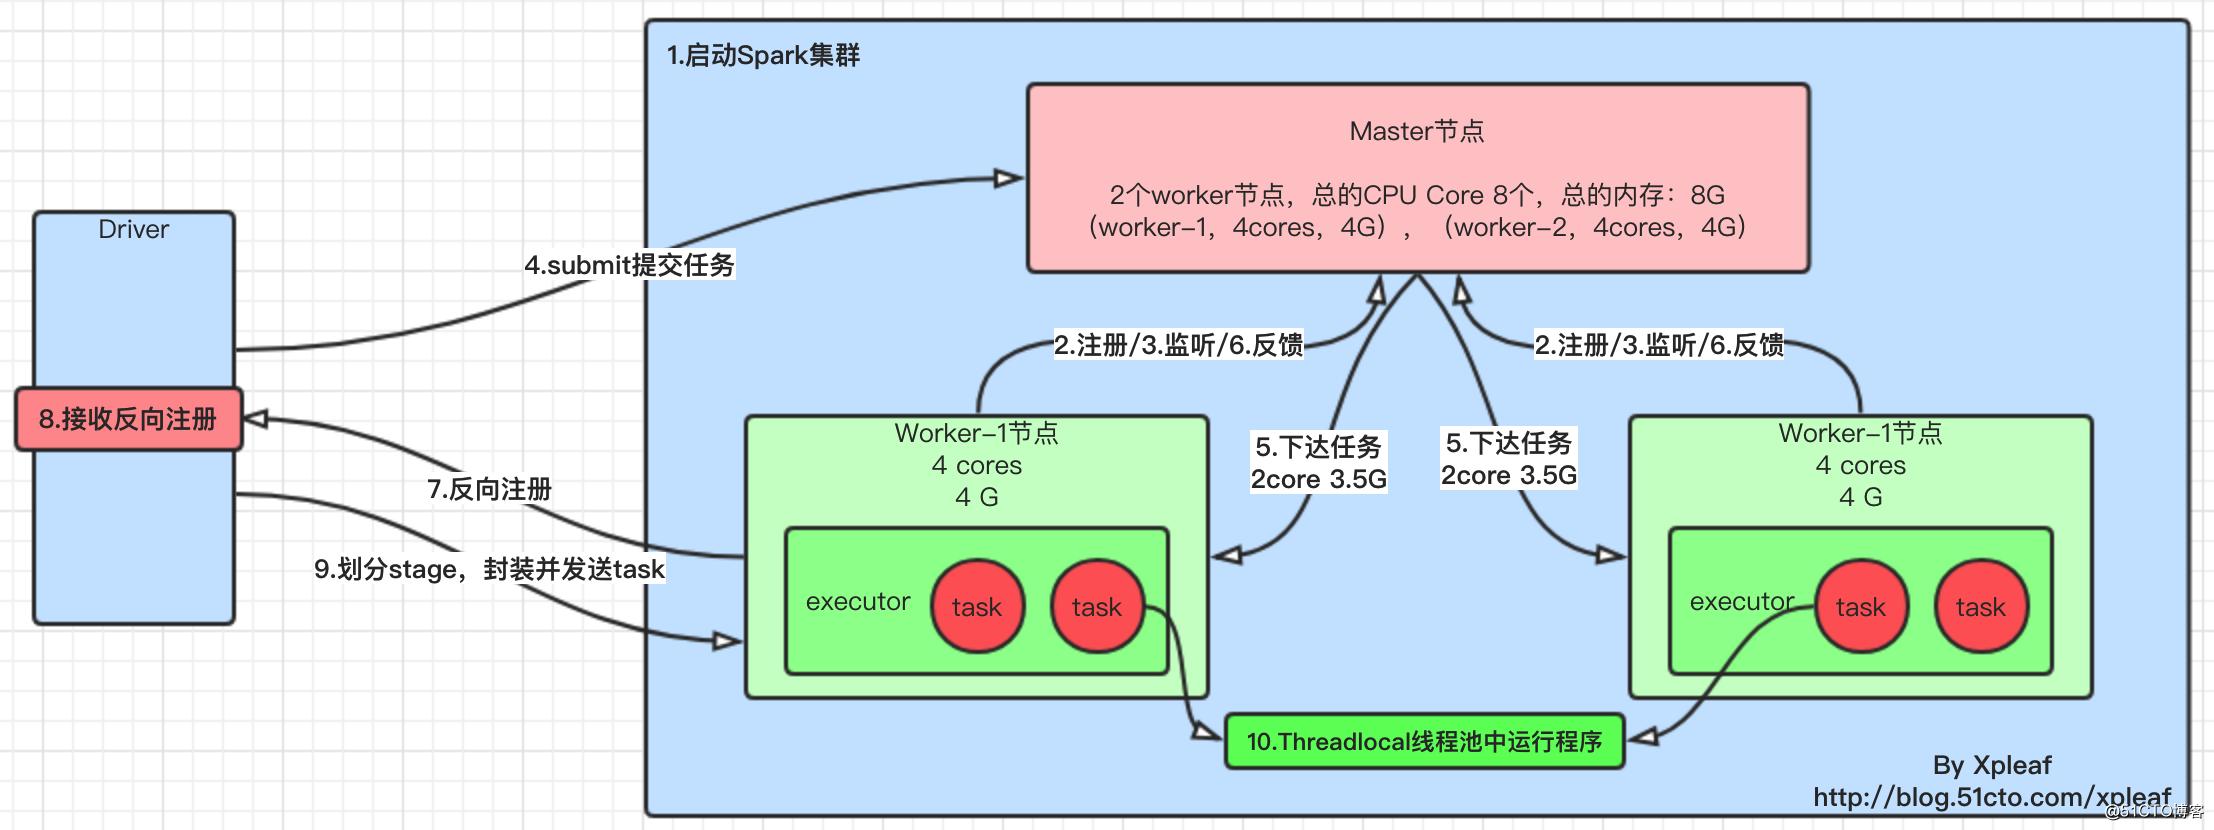 Spark作业运行架构原理解析